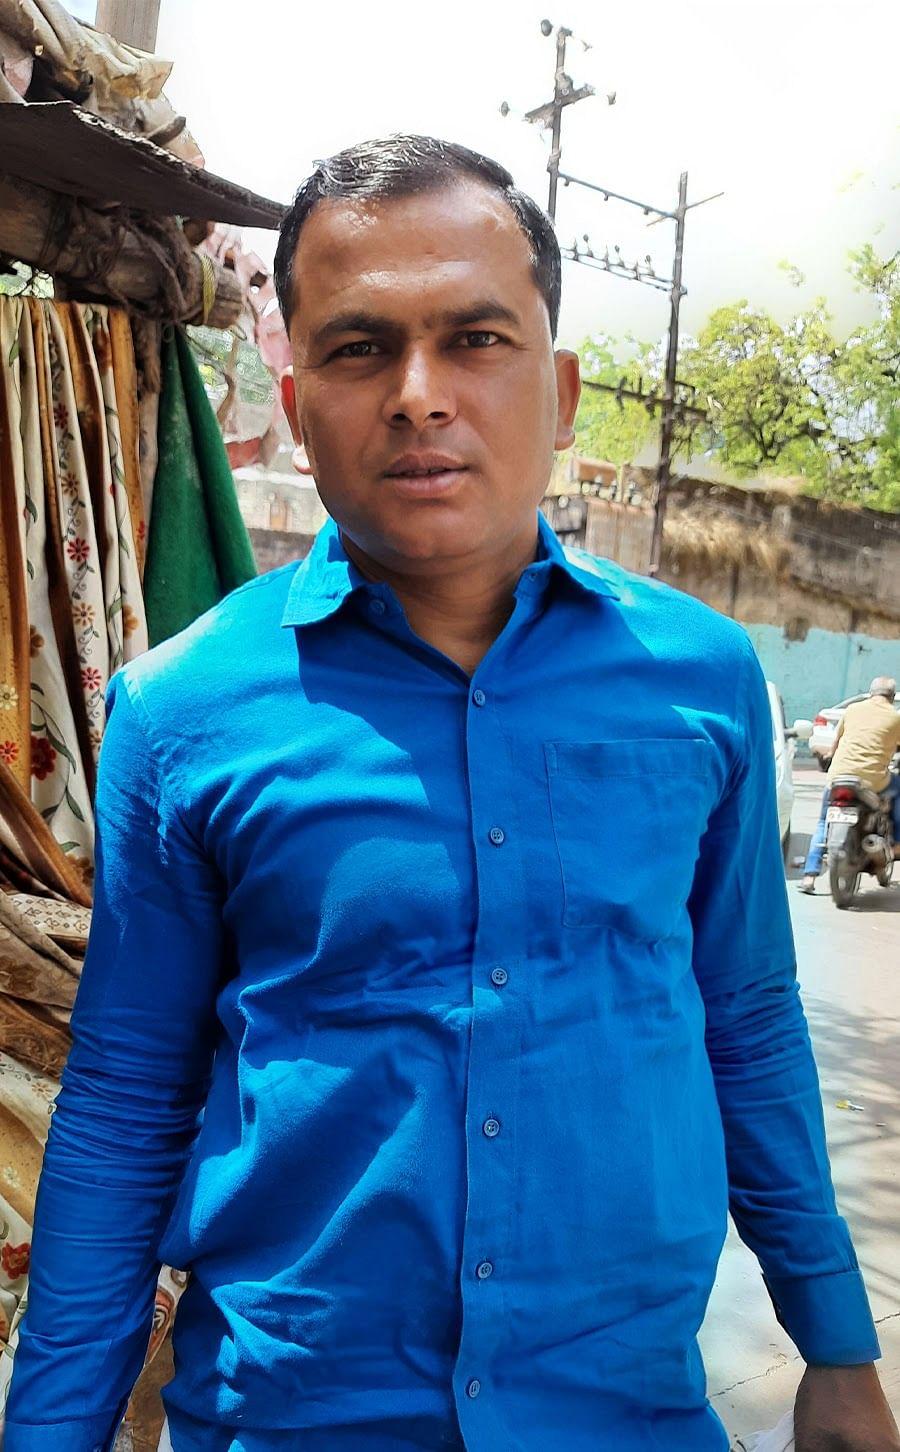 36 वर्षीय साबिर खान